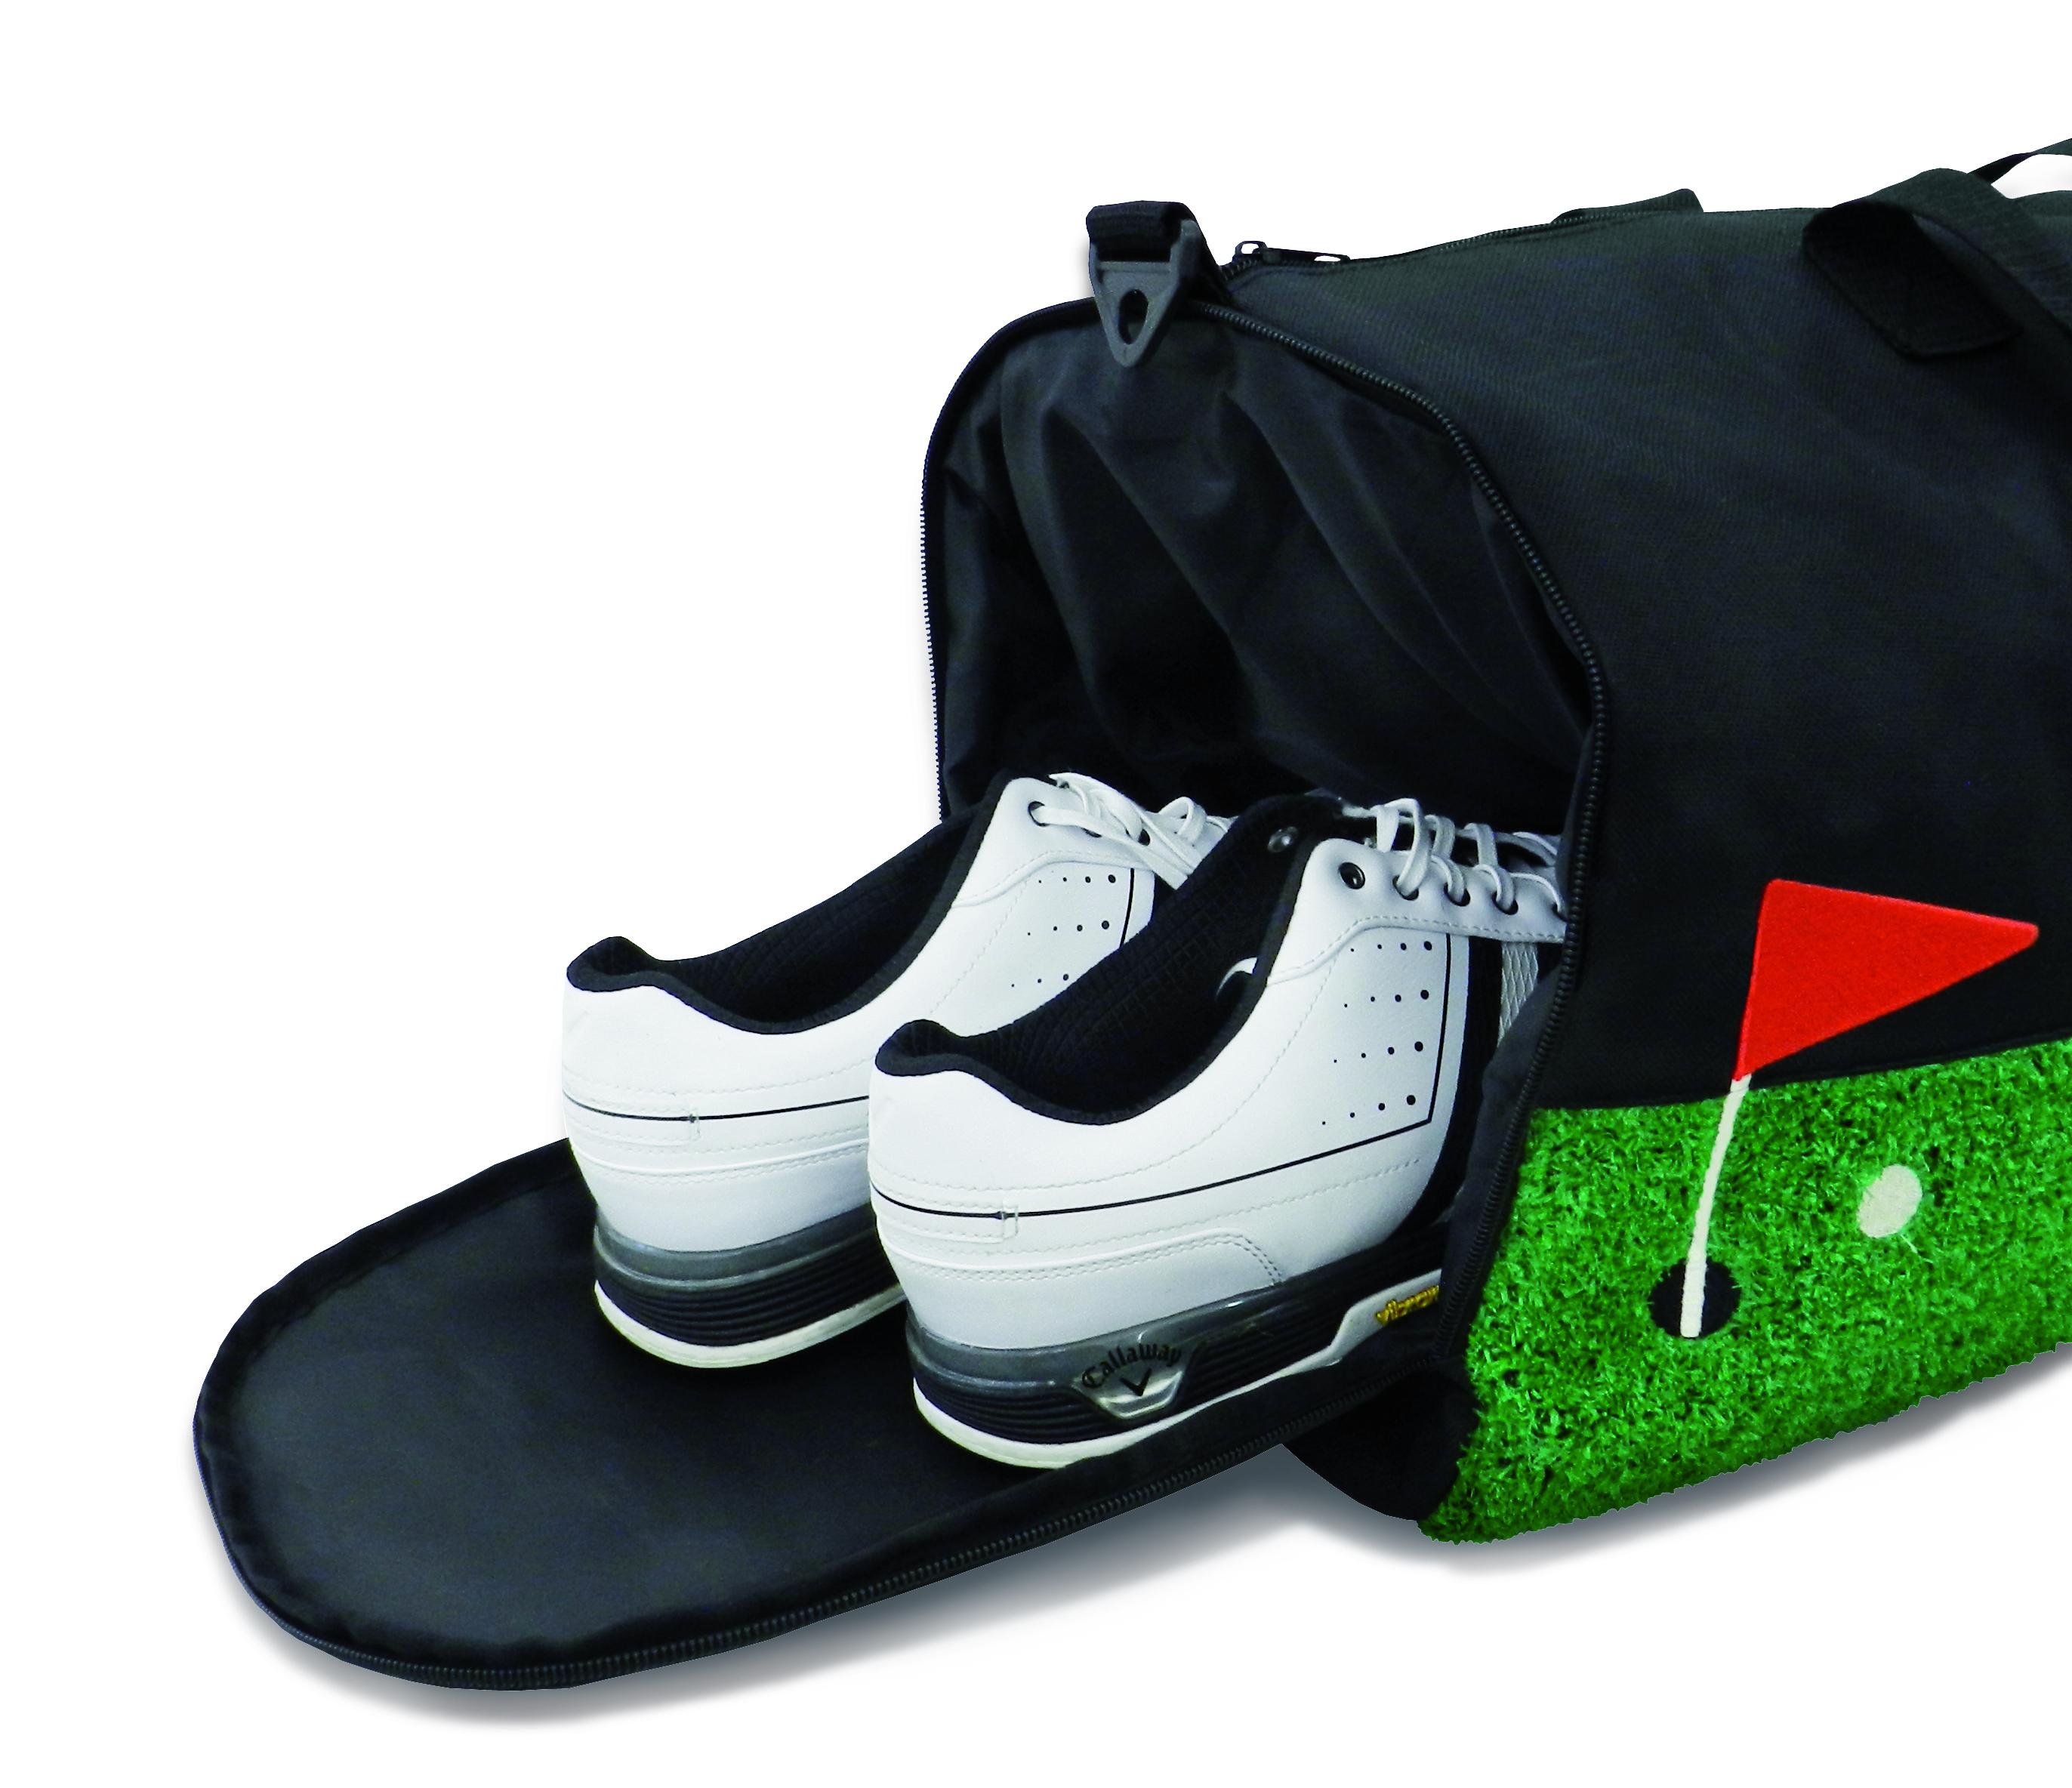 Premium Golftasche